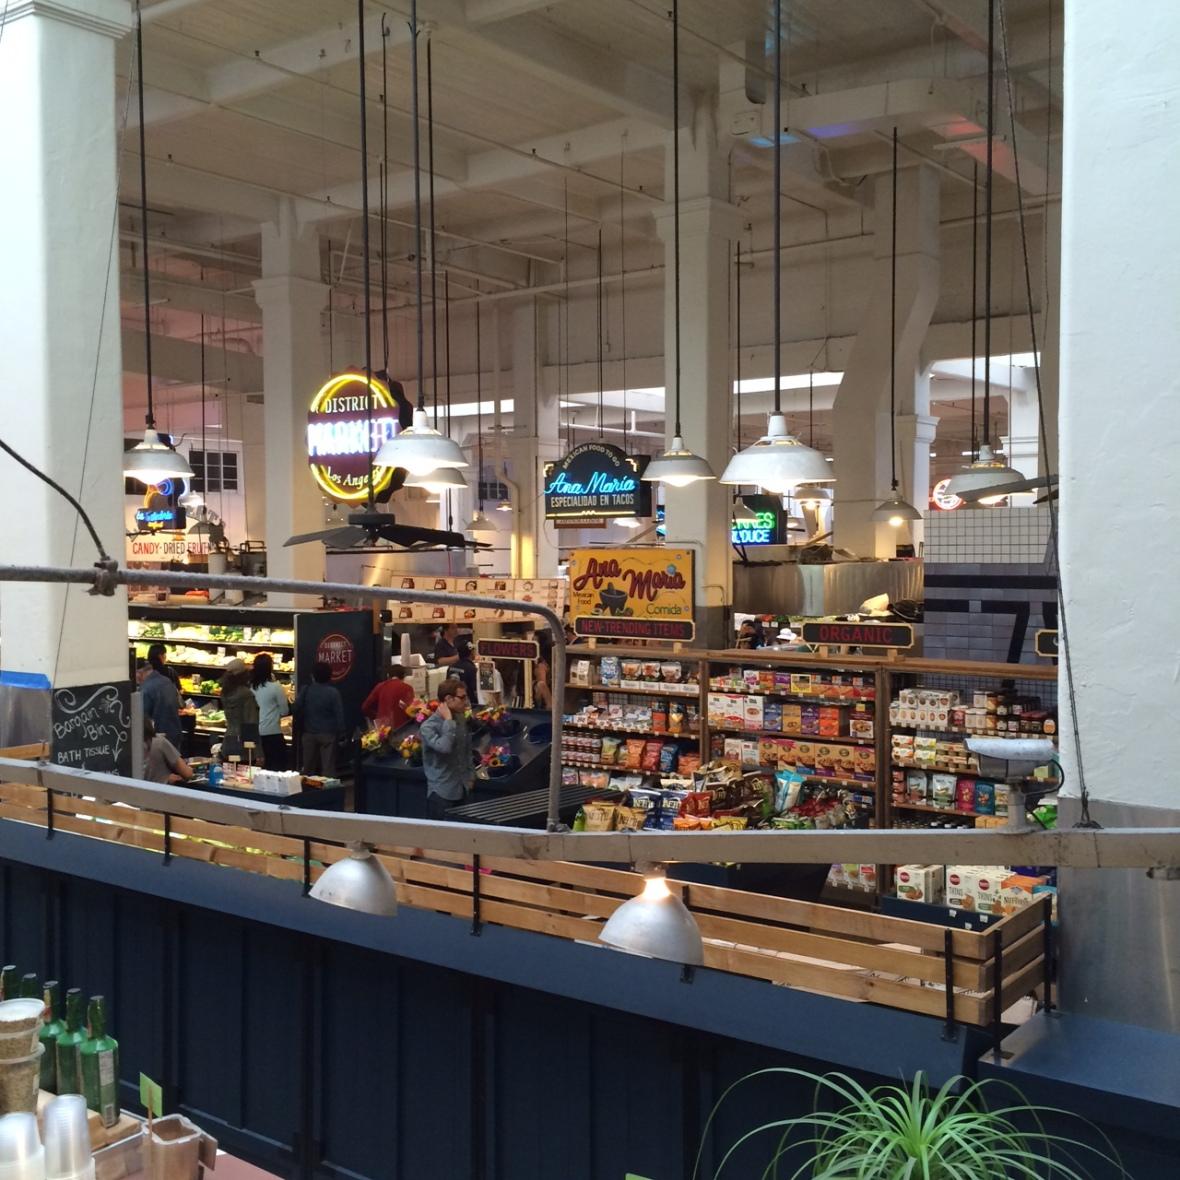 Grand Central Market stands